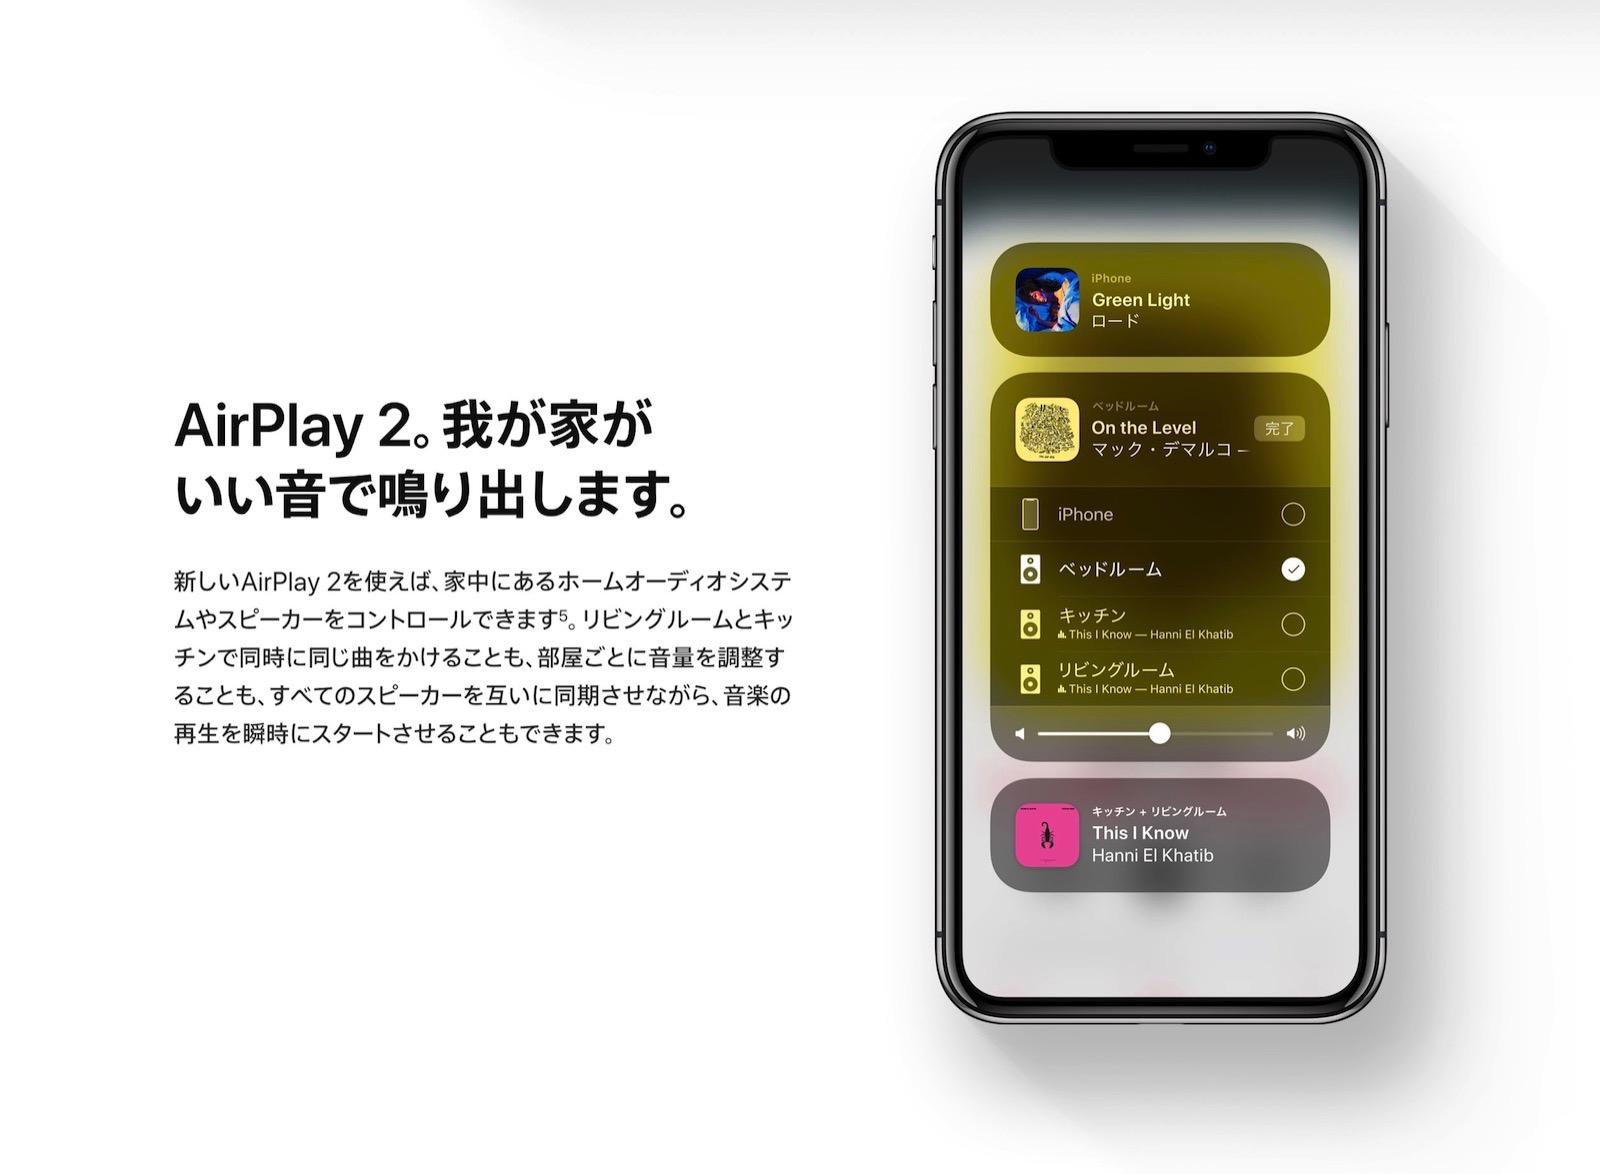 AirPlay2 iOS 11